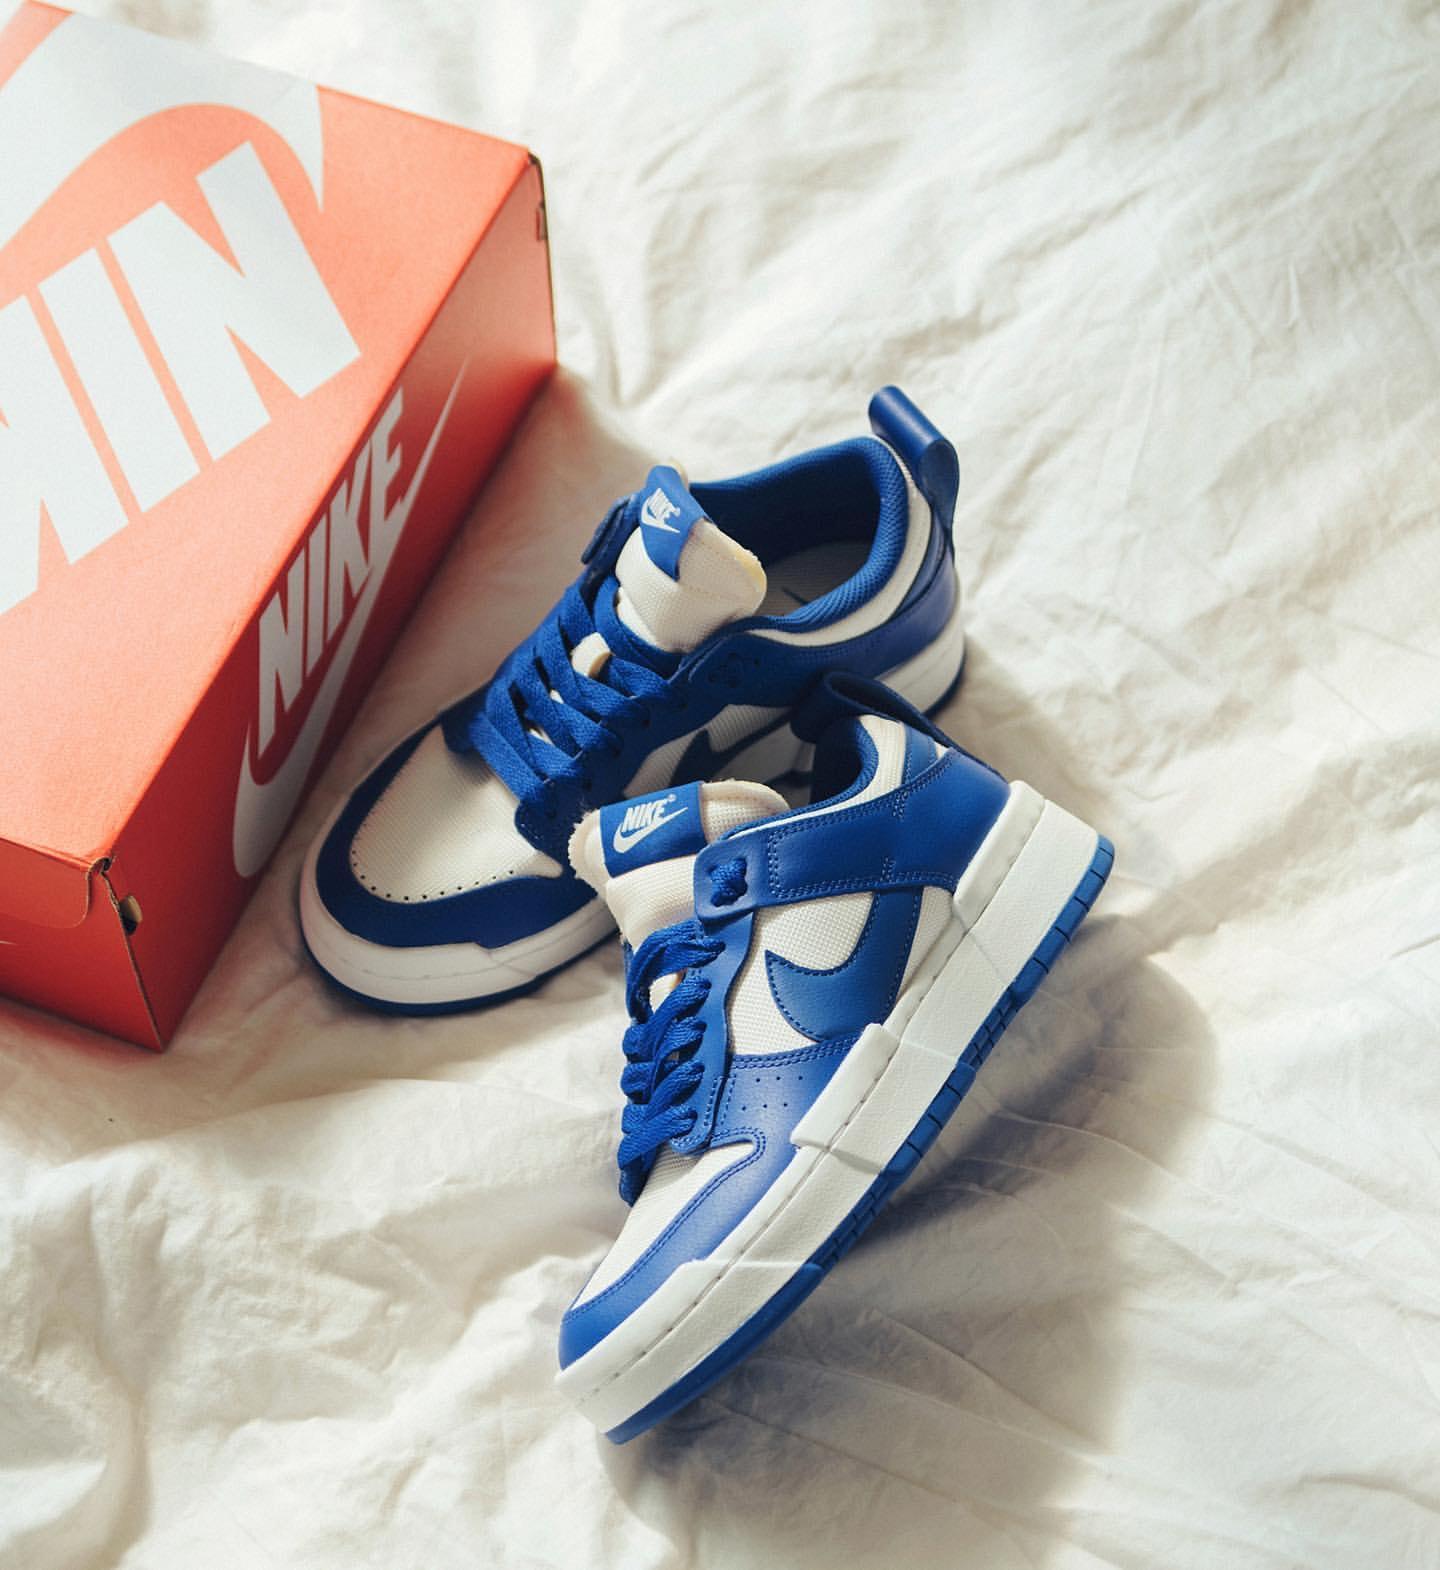 Nike WMNS Dunk Low Disrupt ナイキ ダンク ロー ディスラプト CK6654-100 Game Royal main